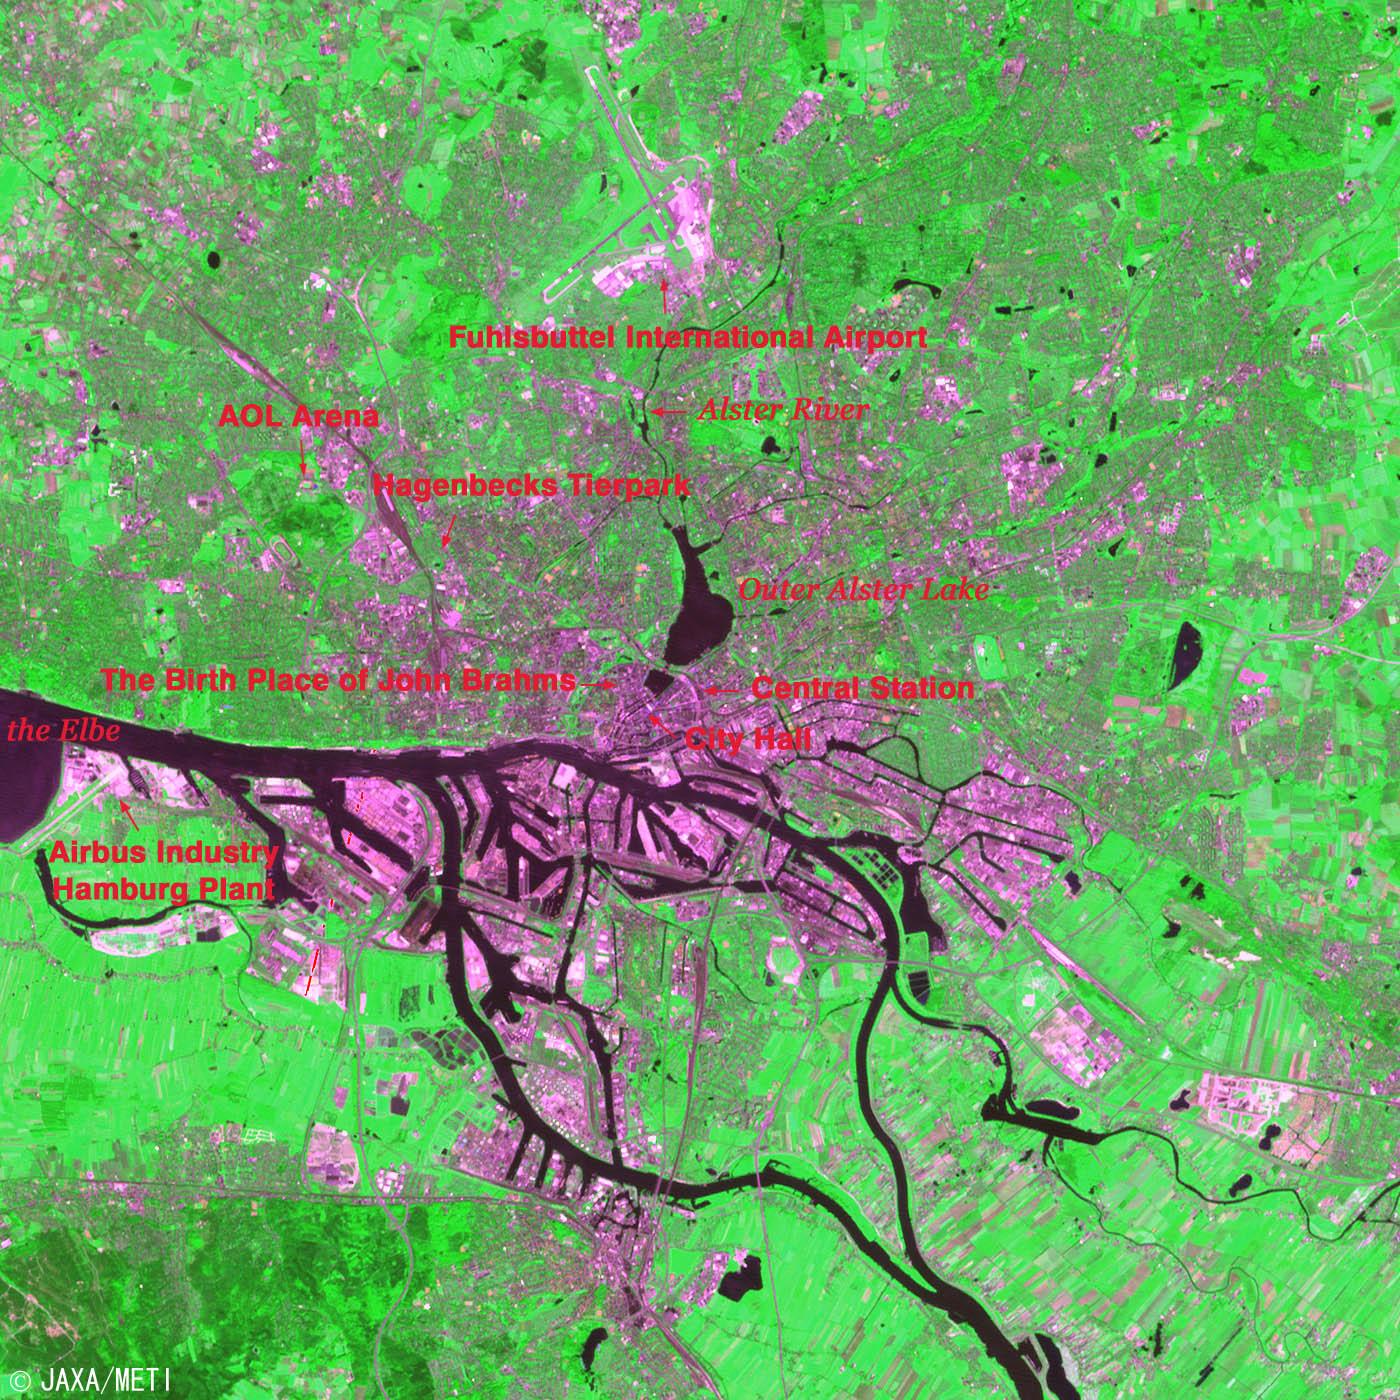 Vista satelital de Hamburgo